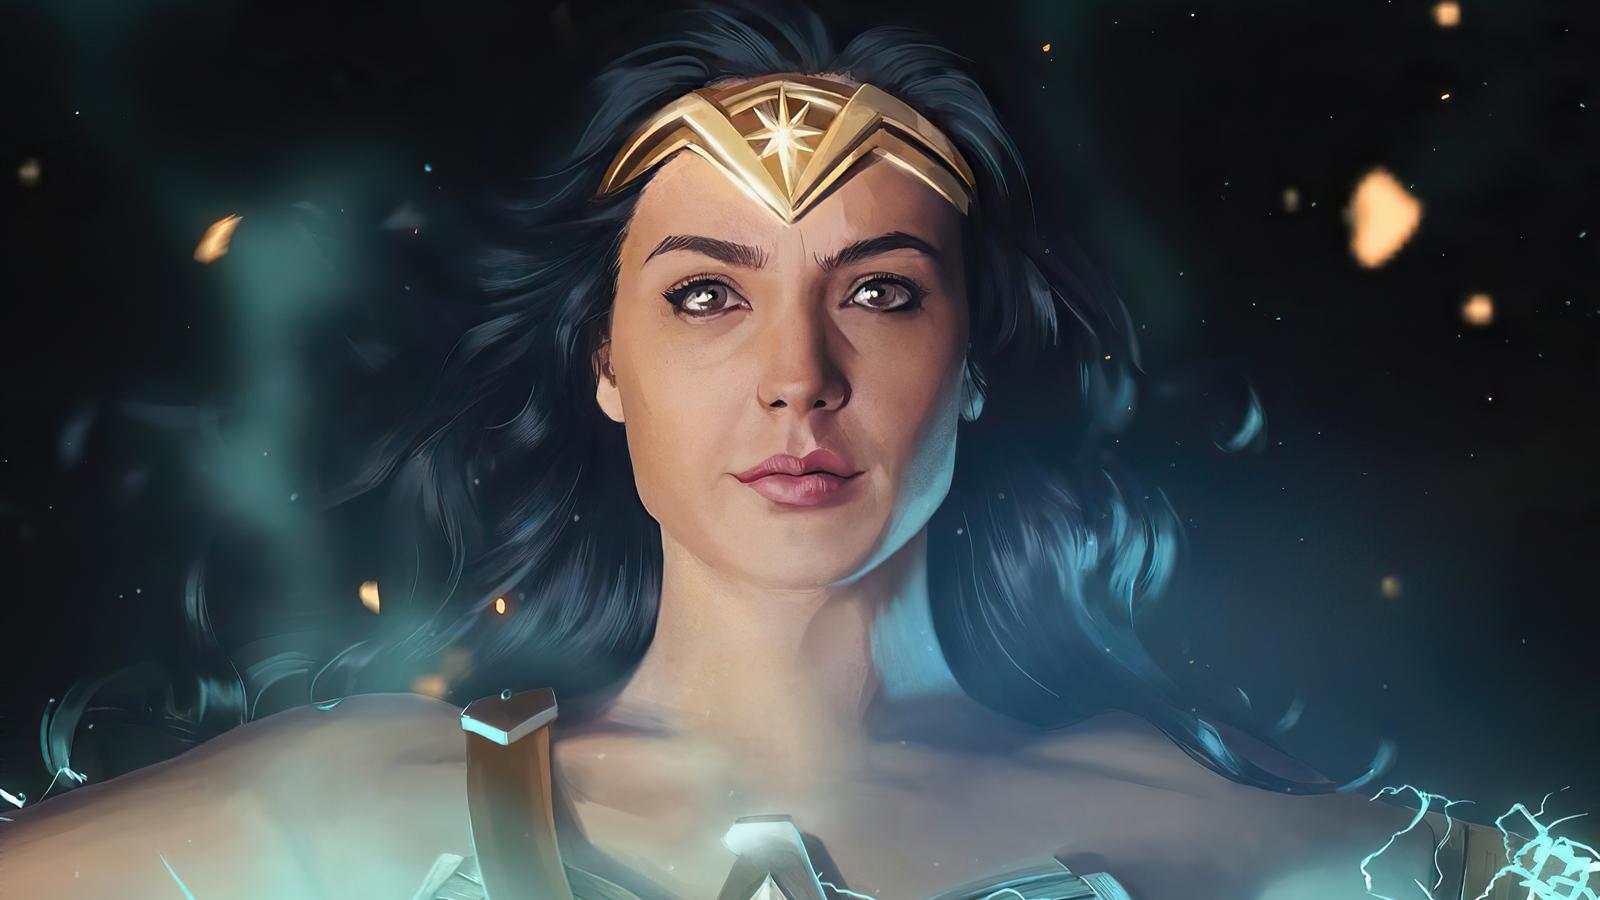 wonder-woman-closeup-4k-6t.jpg